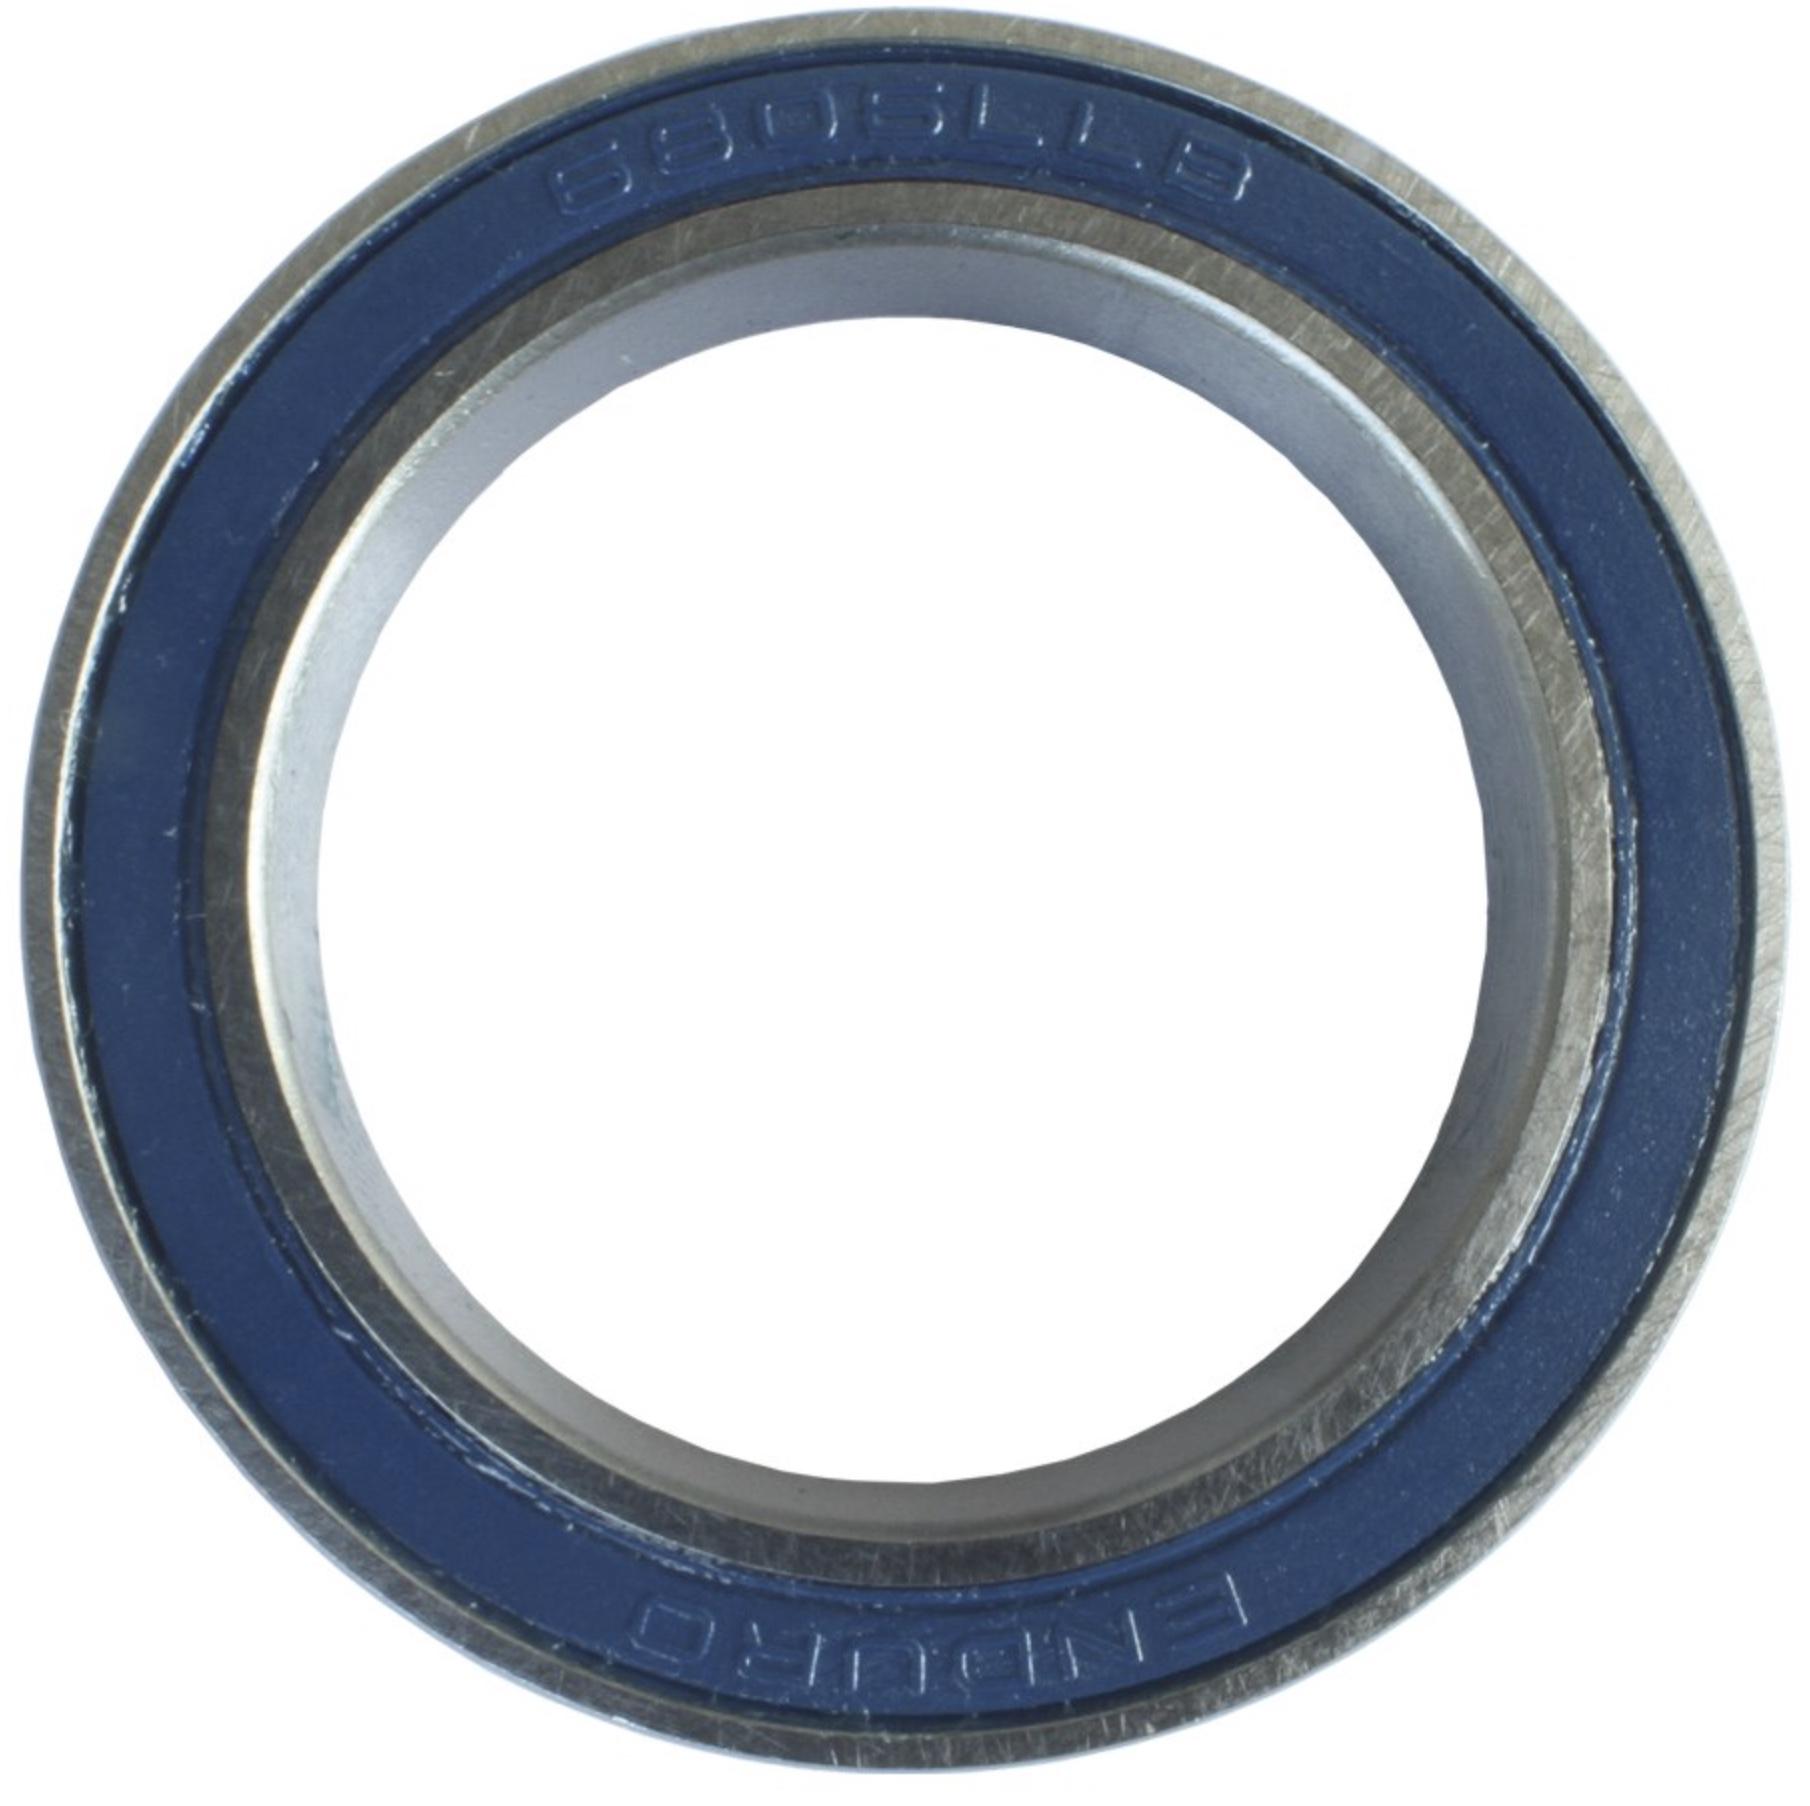 Kugleleje Enduro 6806-2RS ABEC3 LLB (42x30x7 mm) - EB8035 | Bottom brackets bearings